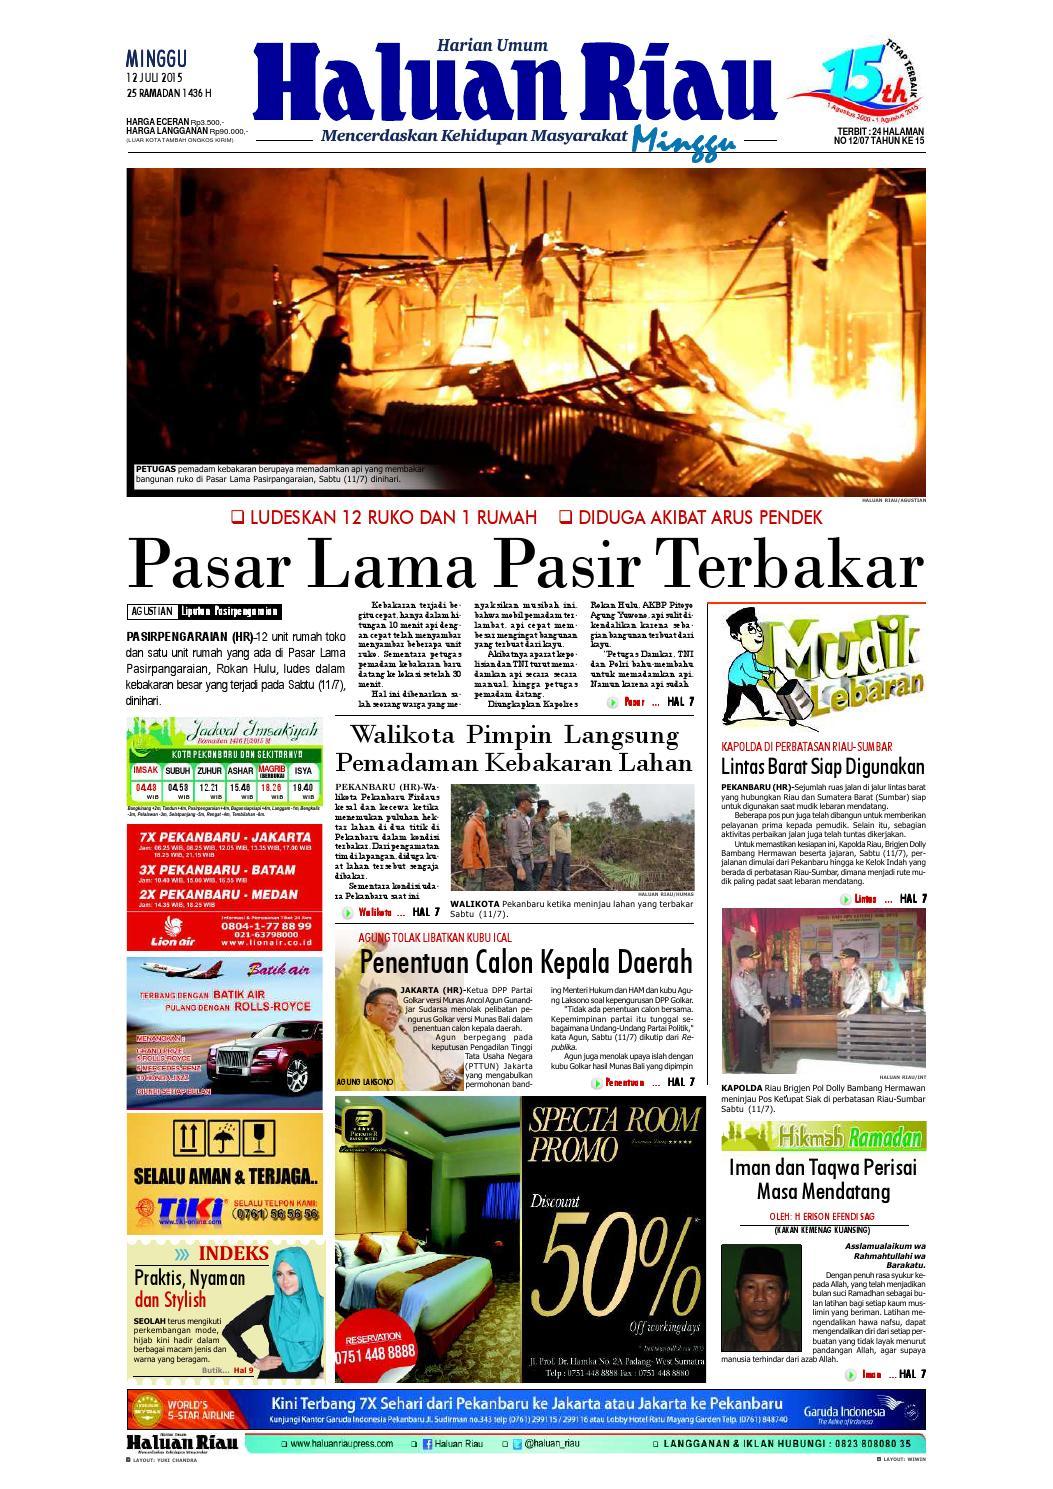 Haluanriau 2015 07 12 By Haluan Riau Issuu Krezi Kamis 17 Bantal Leher Bulu C House